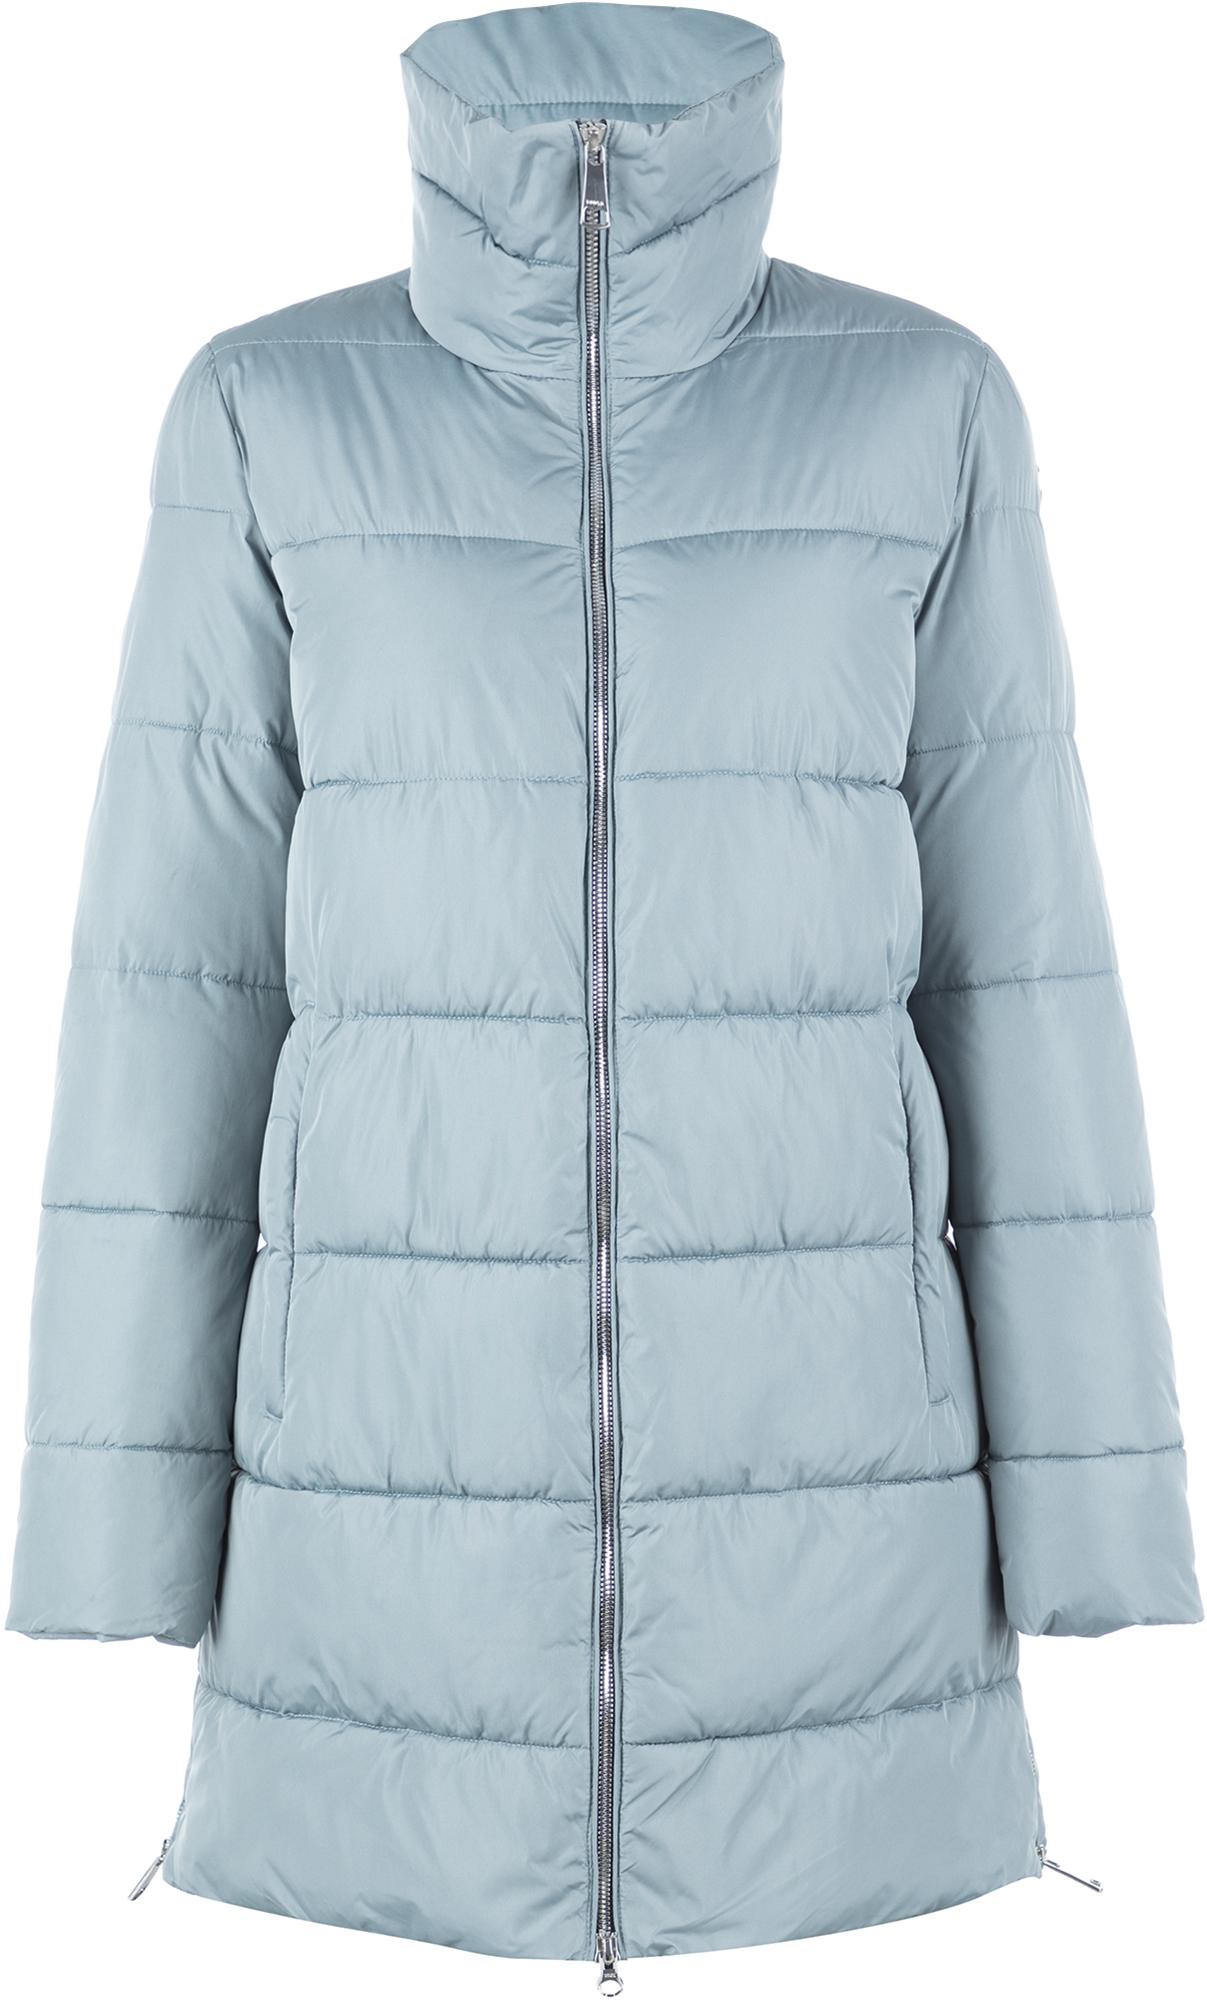 Luhta Куртка утепленная женская Luhta Kuhmoinen, размер 52 luhta куртка утепленная женская luhta petre размер 52